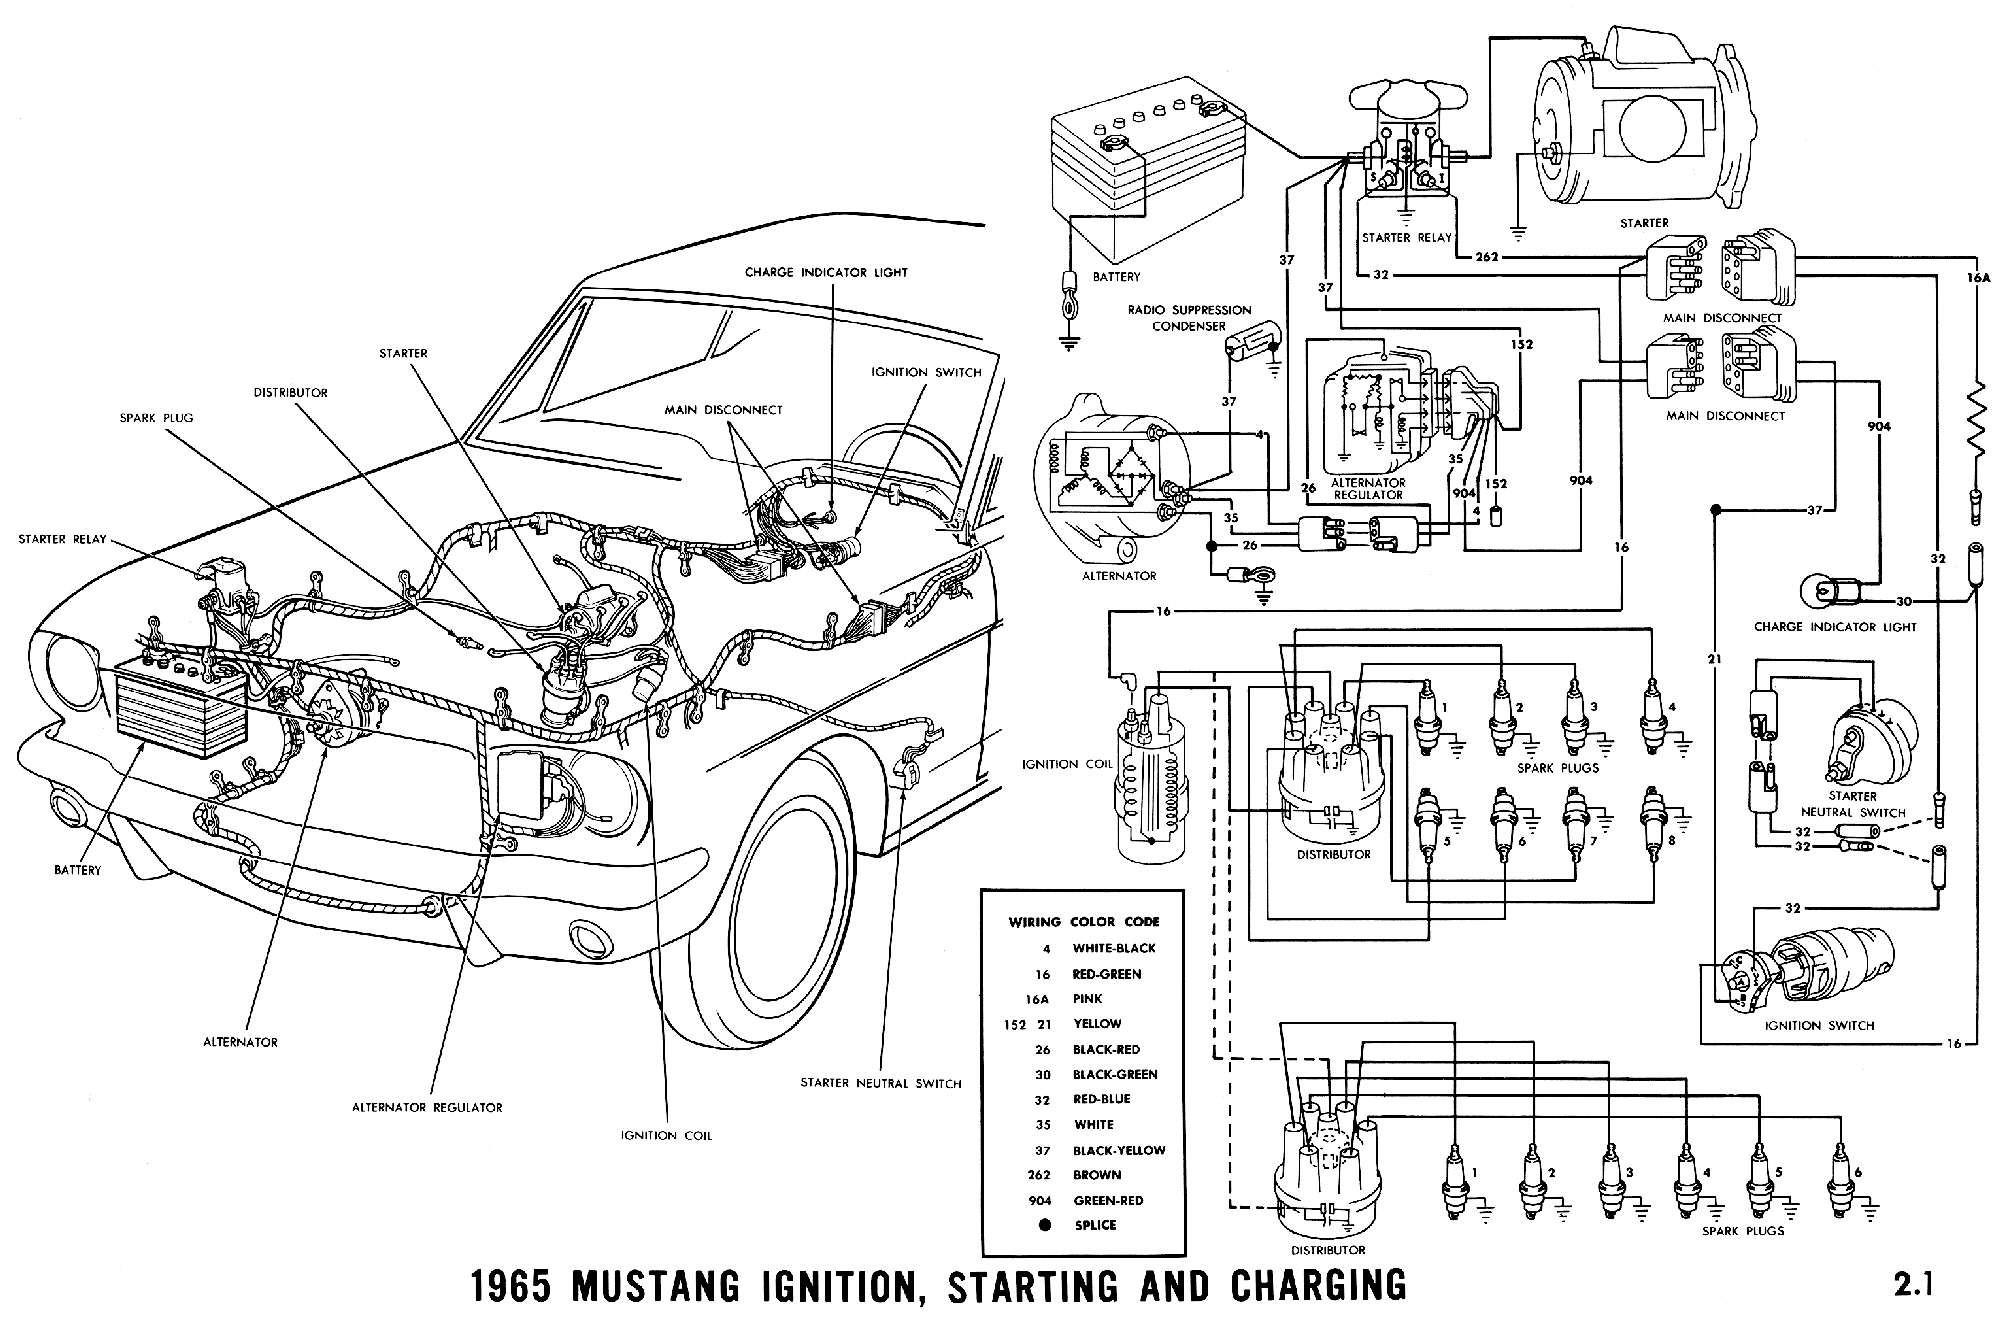 Truck Diagram Parts 2015 Mustang Engine Diagram Engine Car Parts and Ponent Diagram Of Truck Diagram Parts